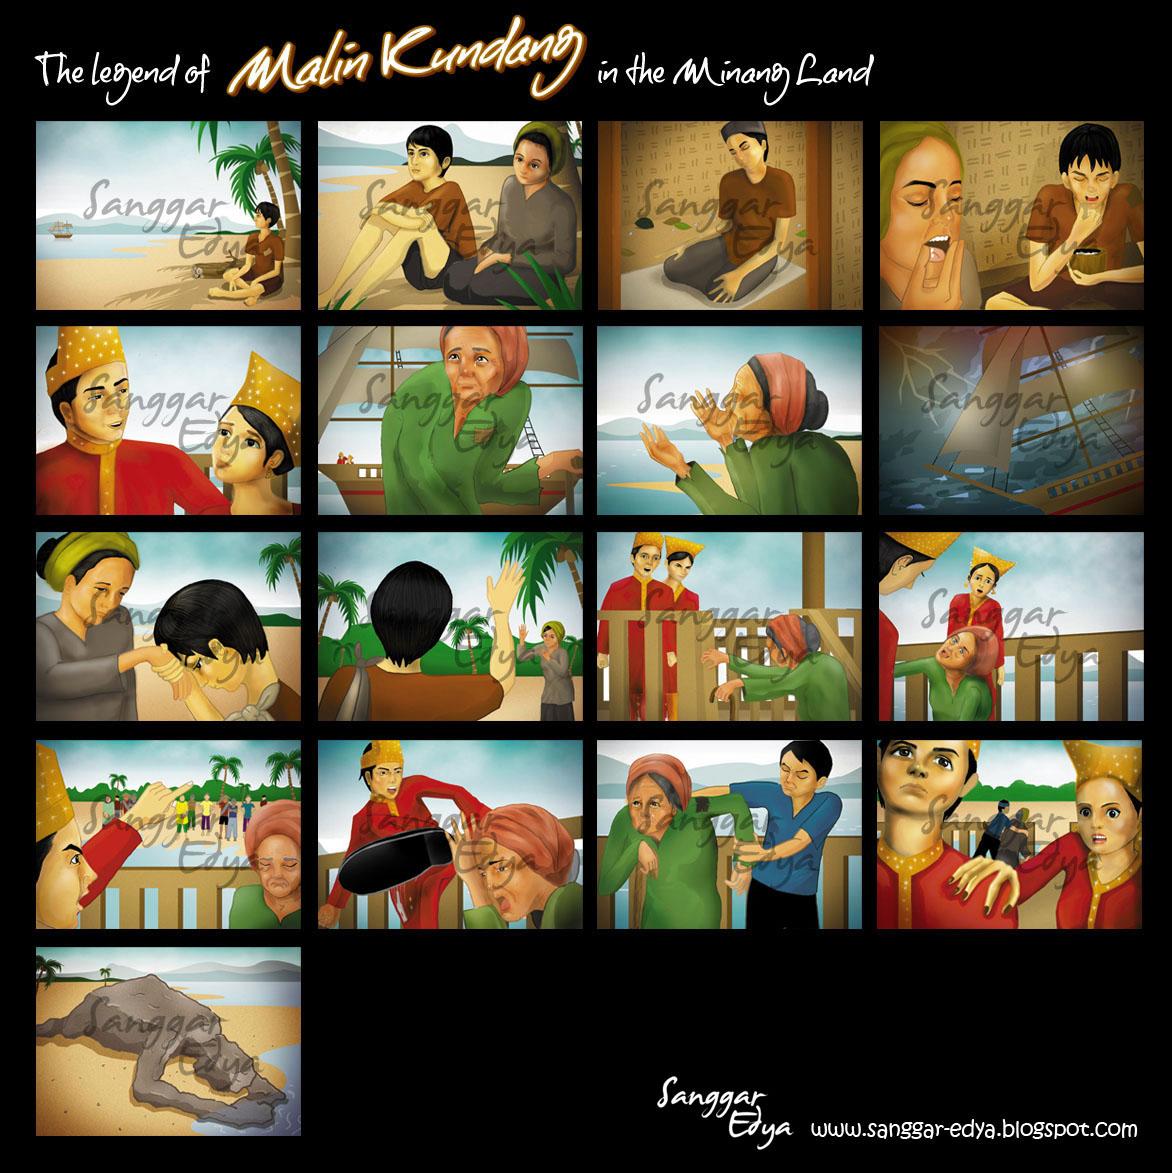 The legend of malin kundang&;